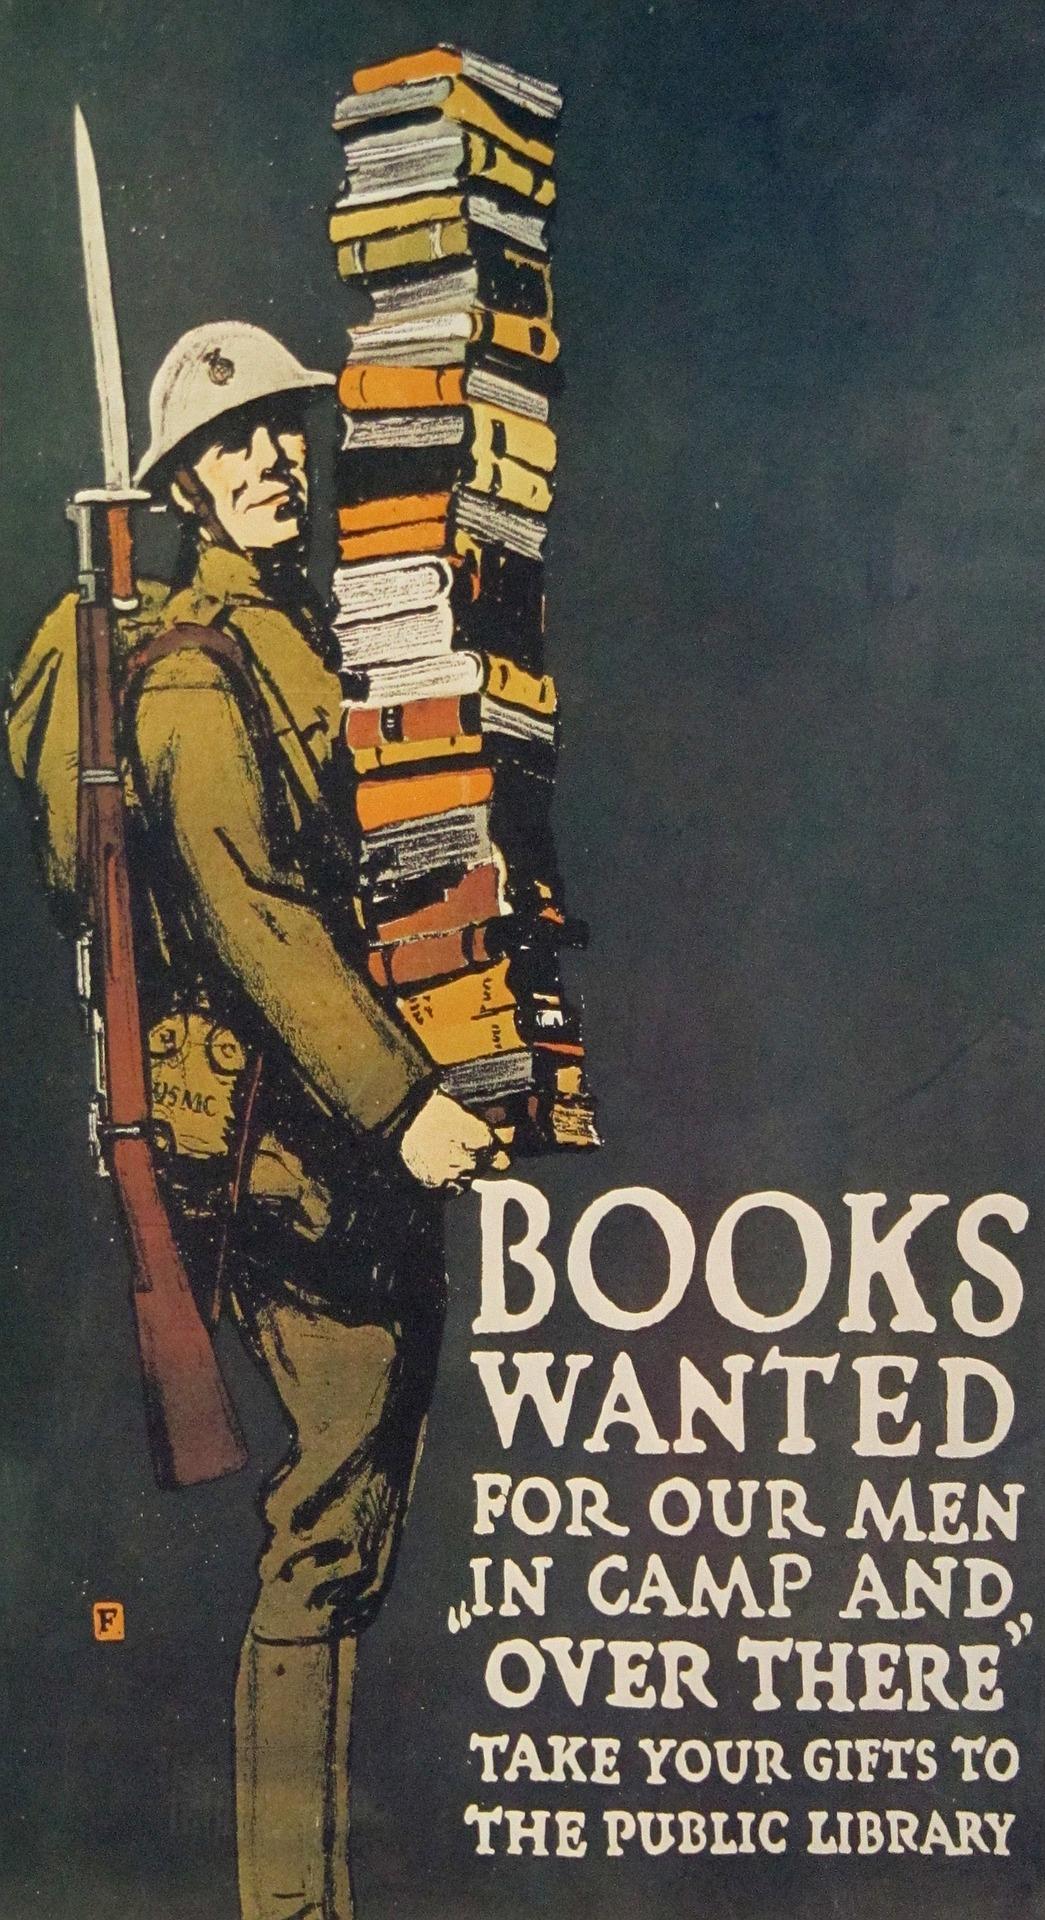 World War I library poster - books